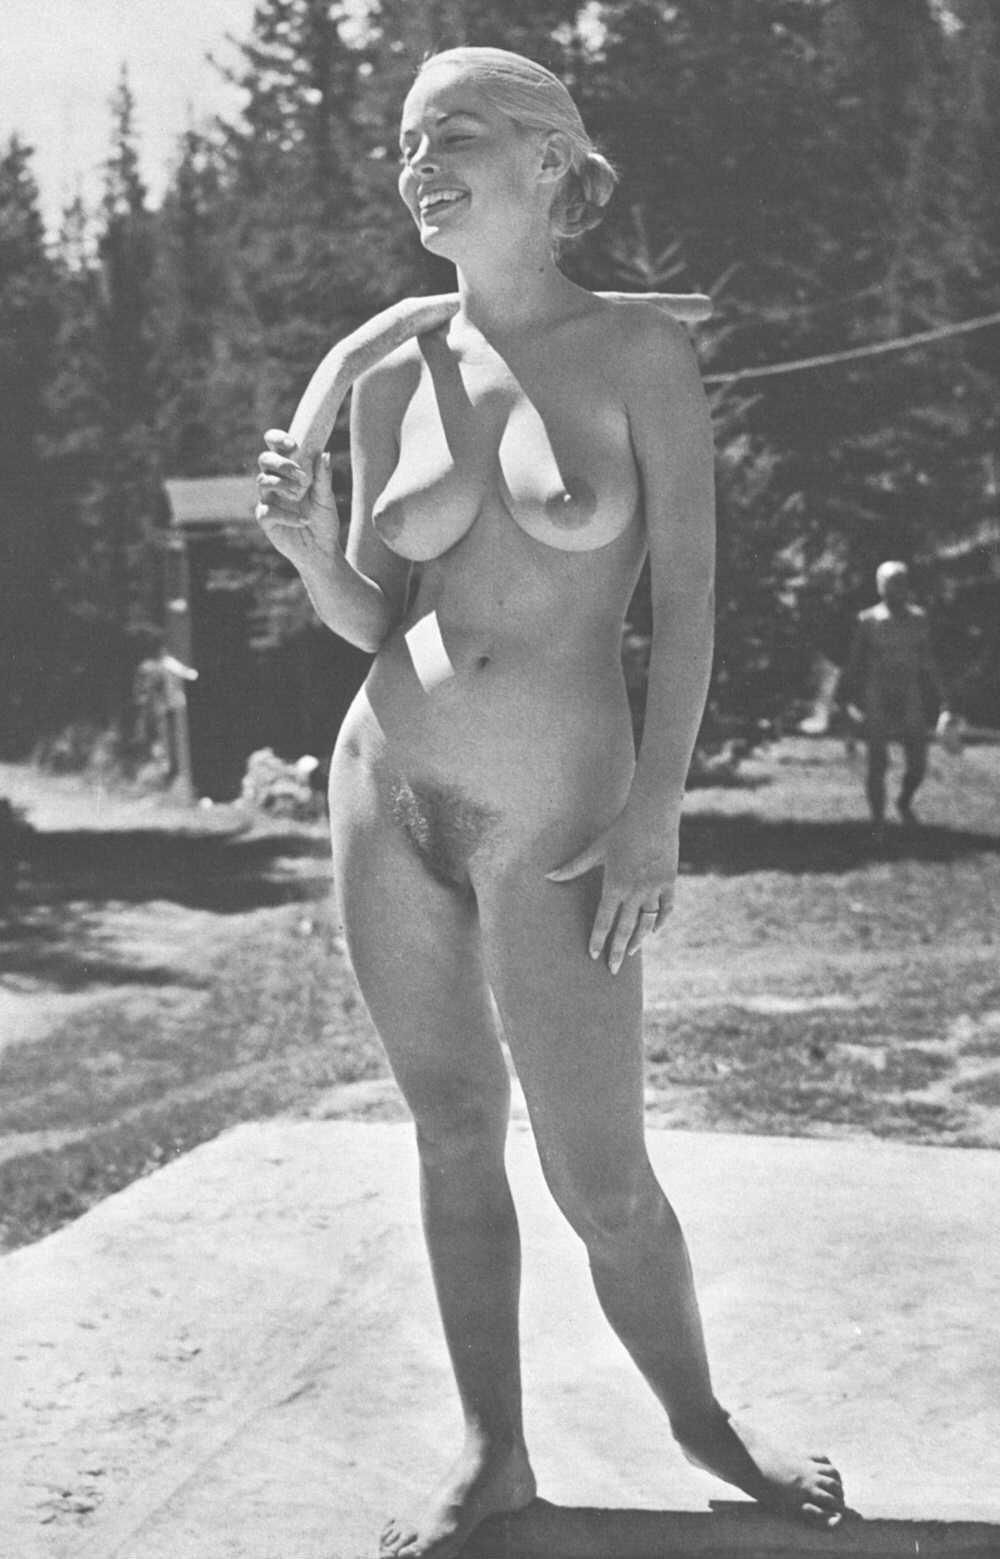 Sonnenfreunde galleries nude nudists magazines commit error